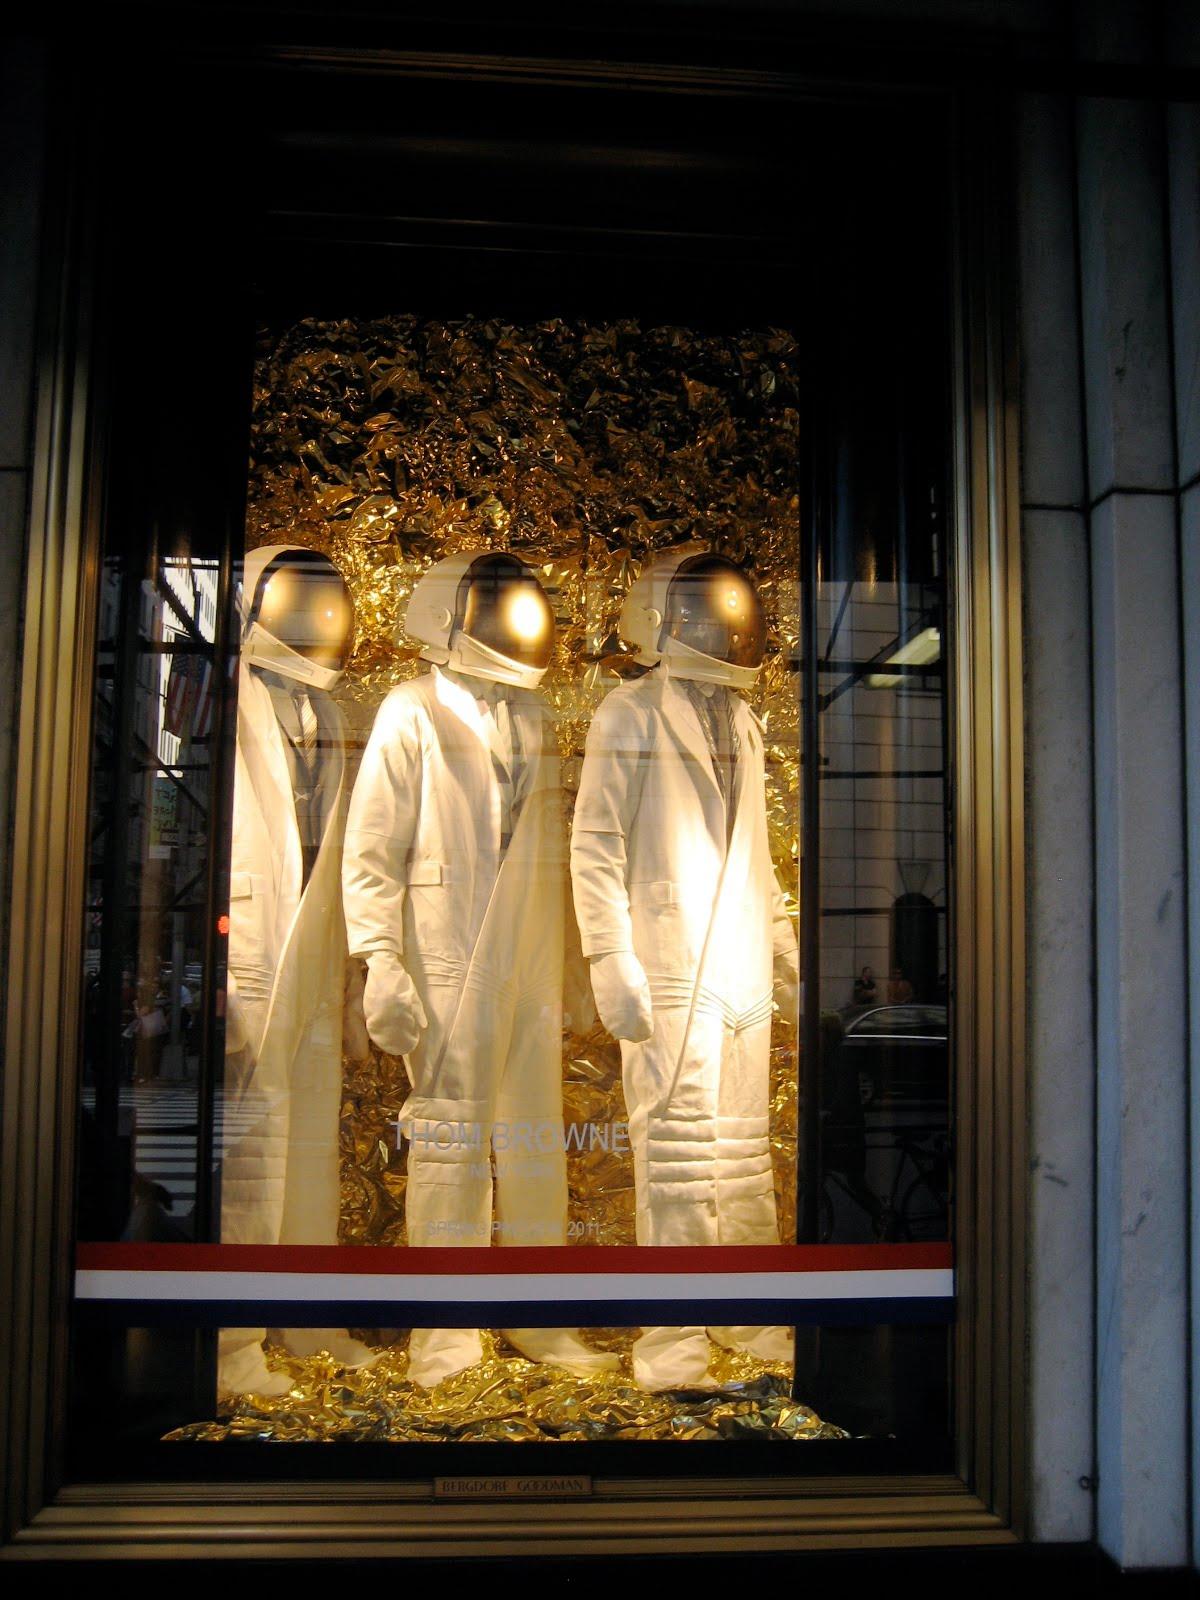 Thom browne windows at bergdorf goodman nyc